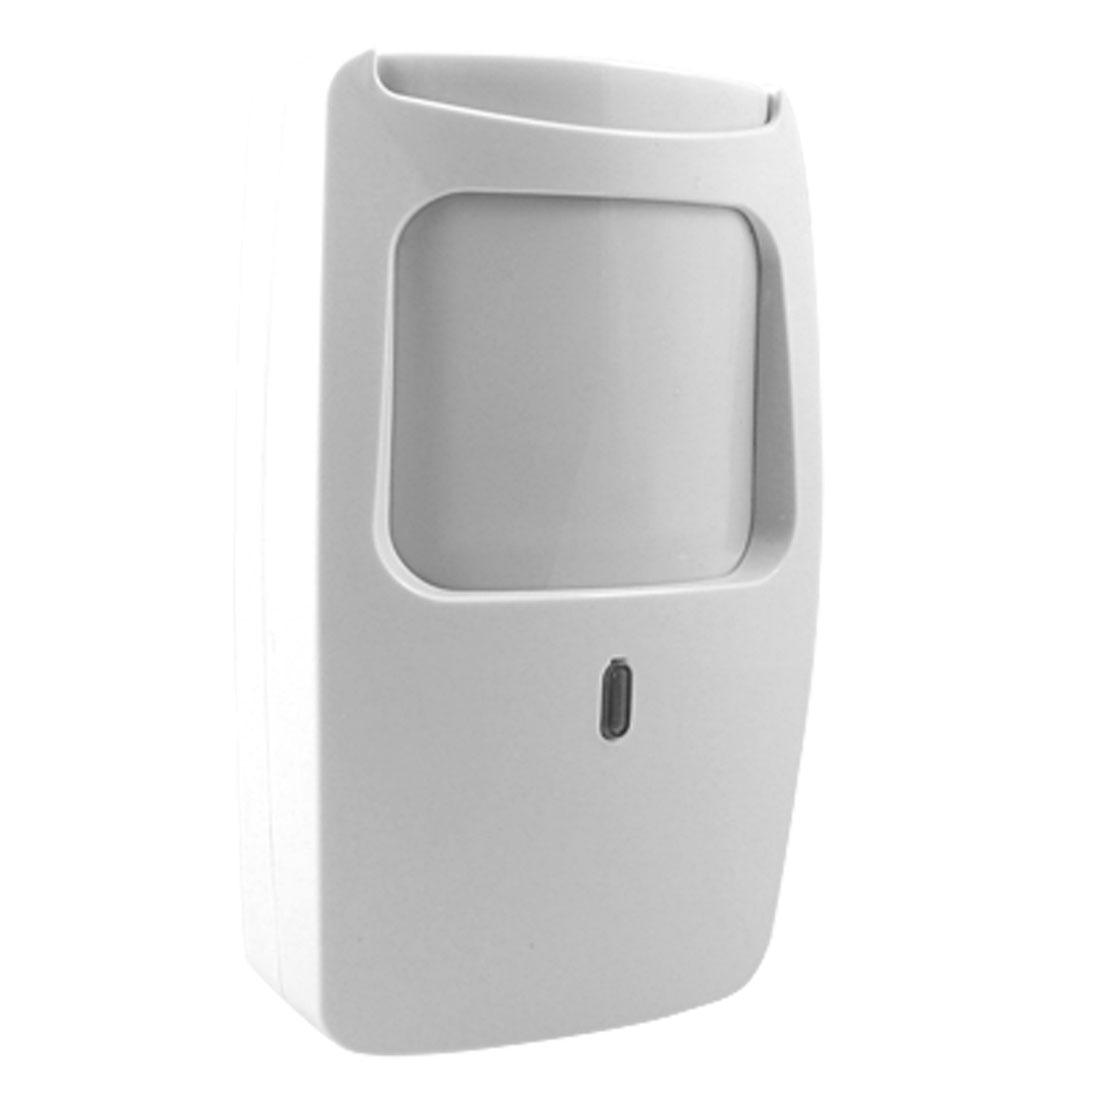 Dual Infrared Microwave Digital Motion Detector Sensor PIR Alarm DT-7225